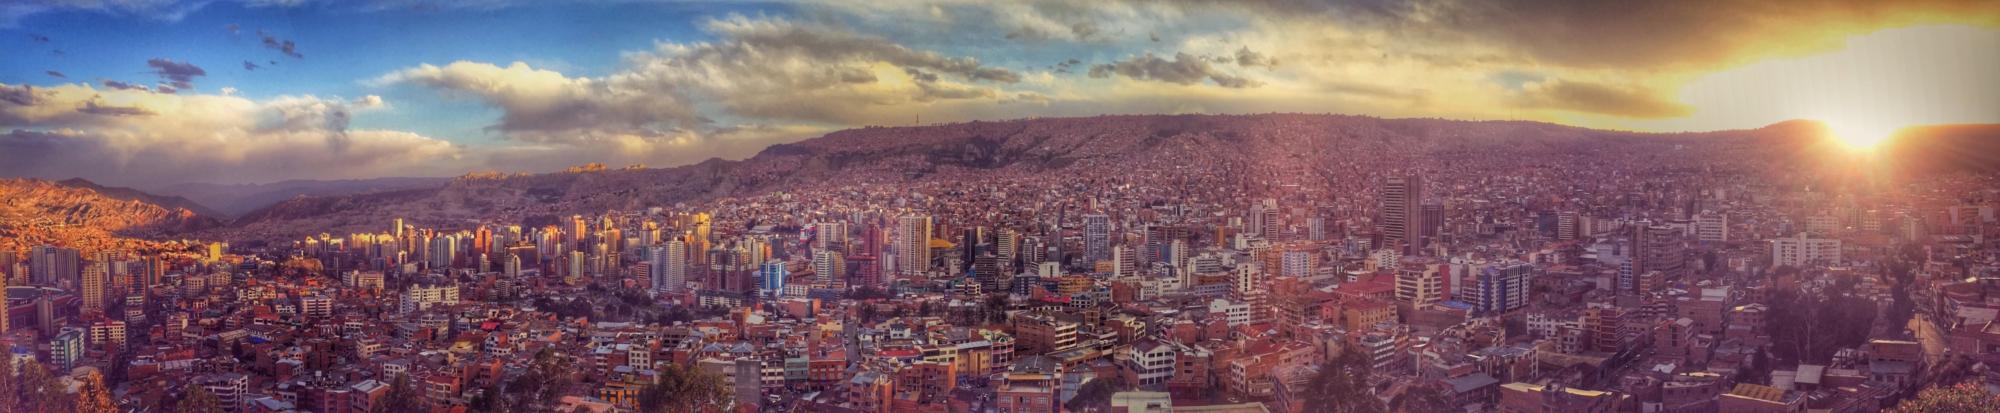 La_Paz_Panoramic_View_from_Killi_Killi_Lookout-e1467885788187